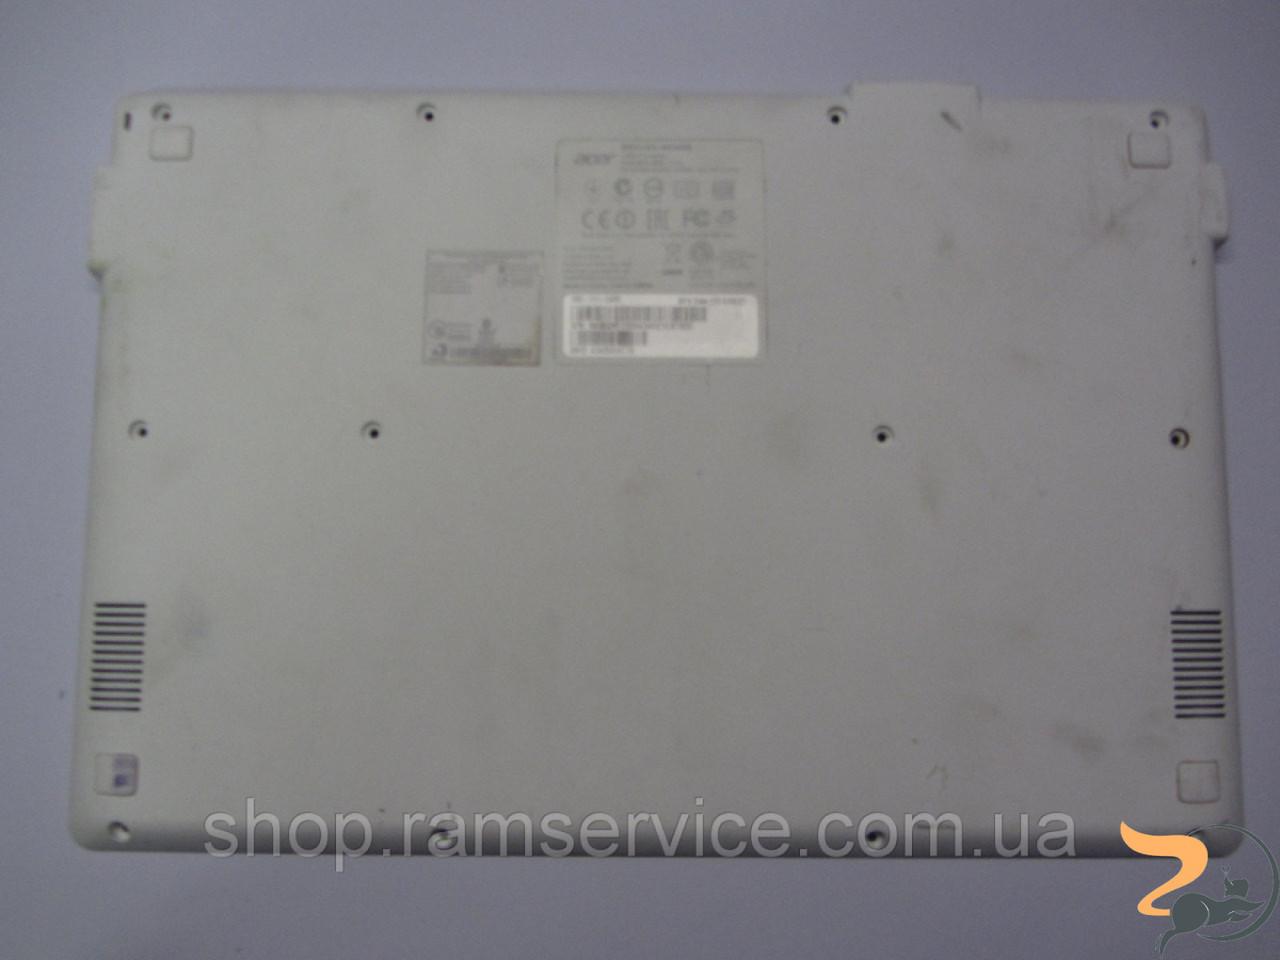 Нижня частина корпусу для ноутбука Acer CB3-111 ChromeBook, б/в